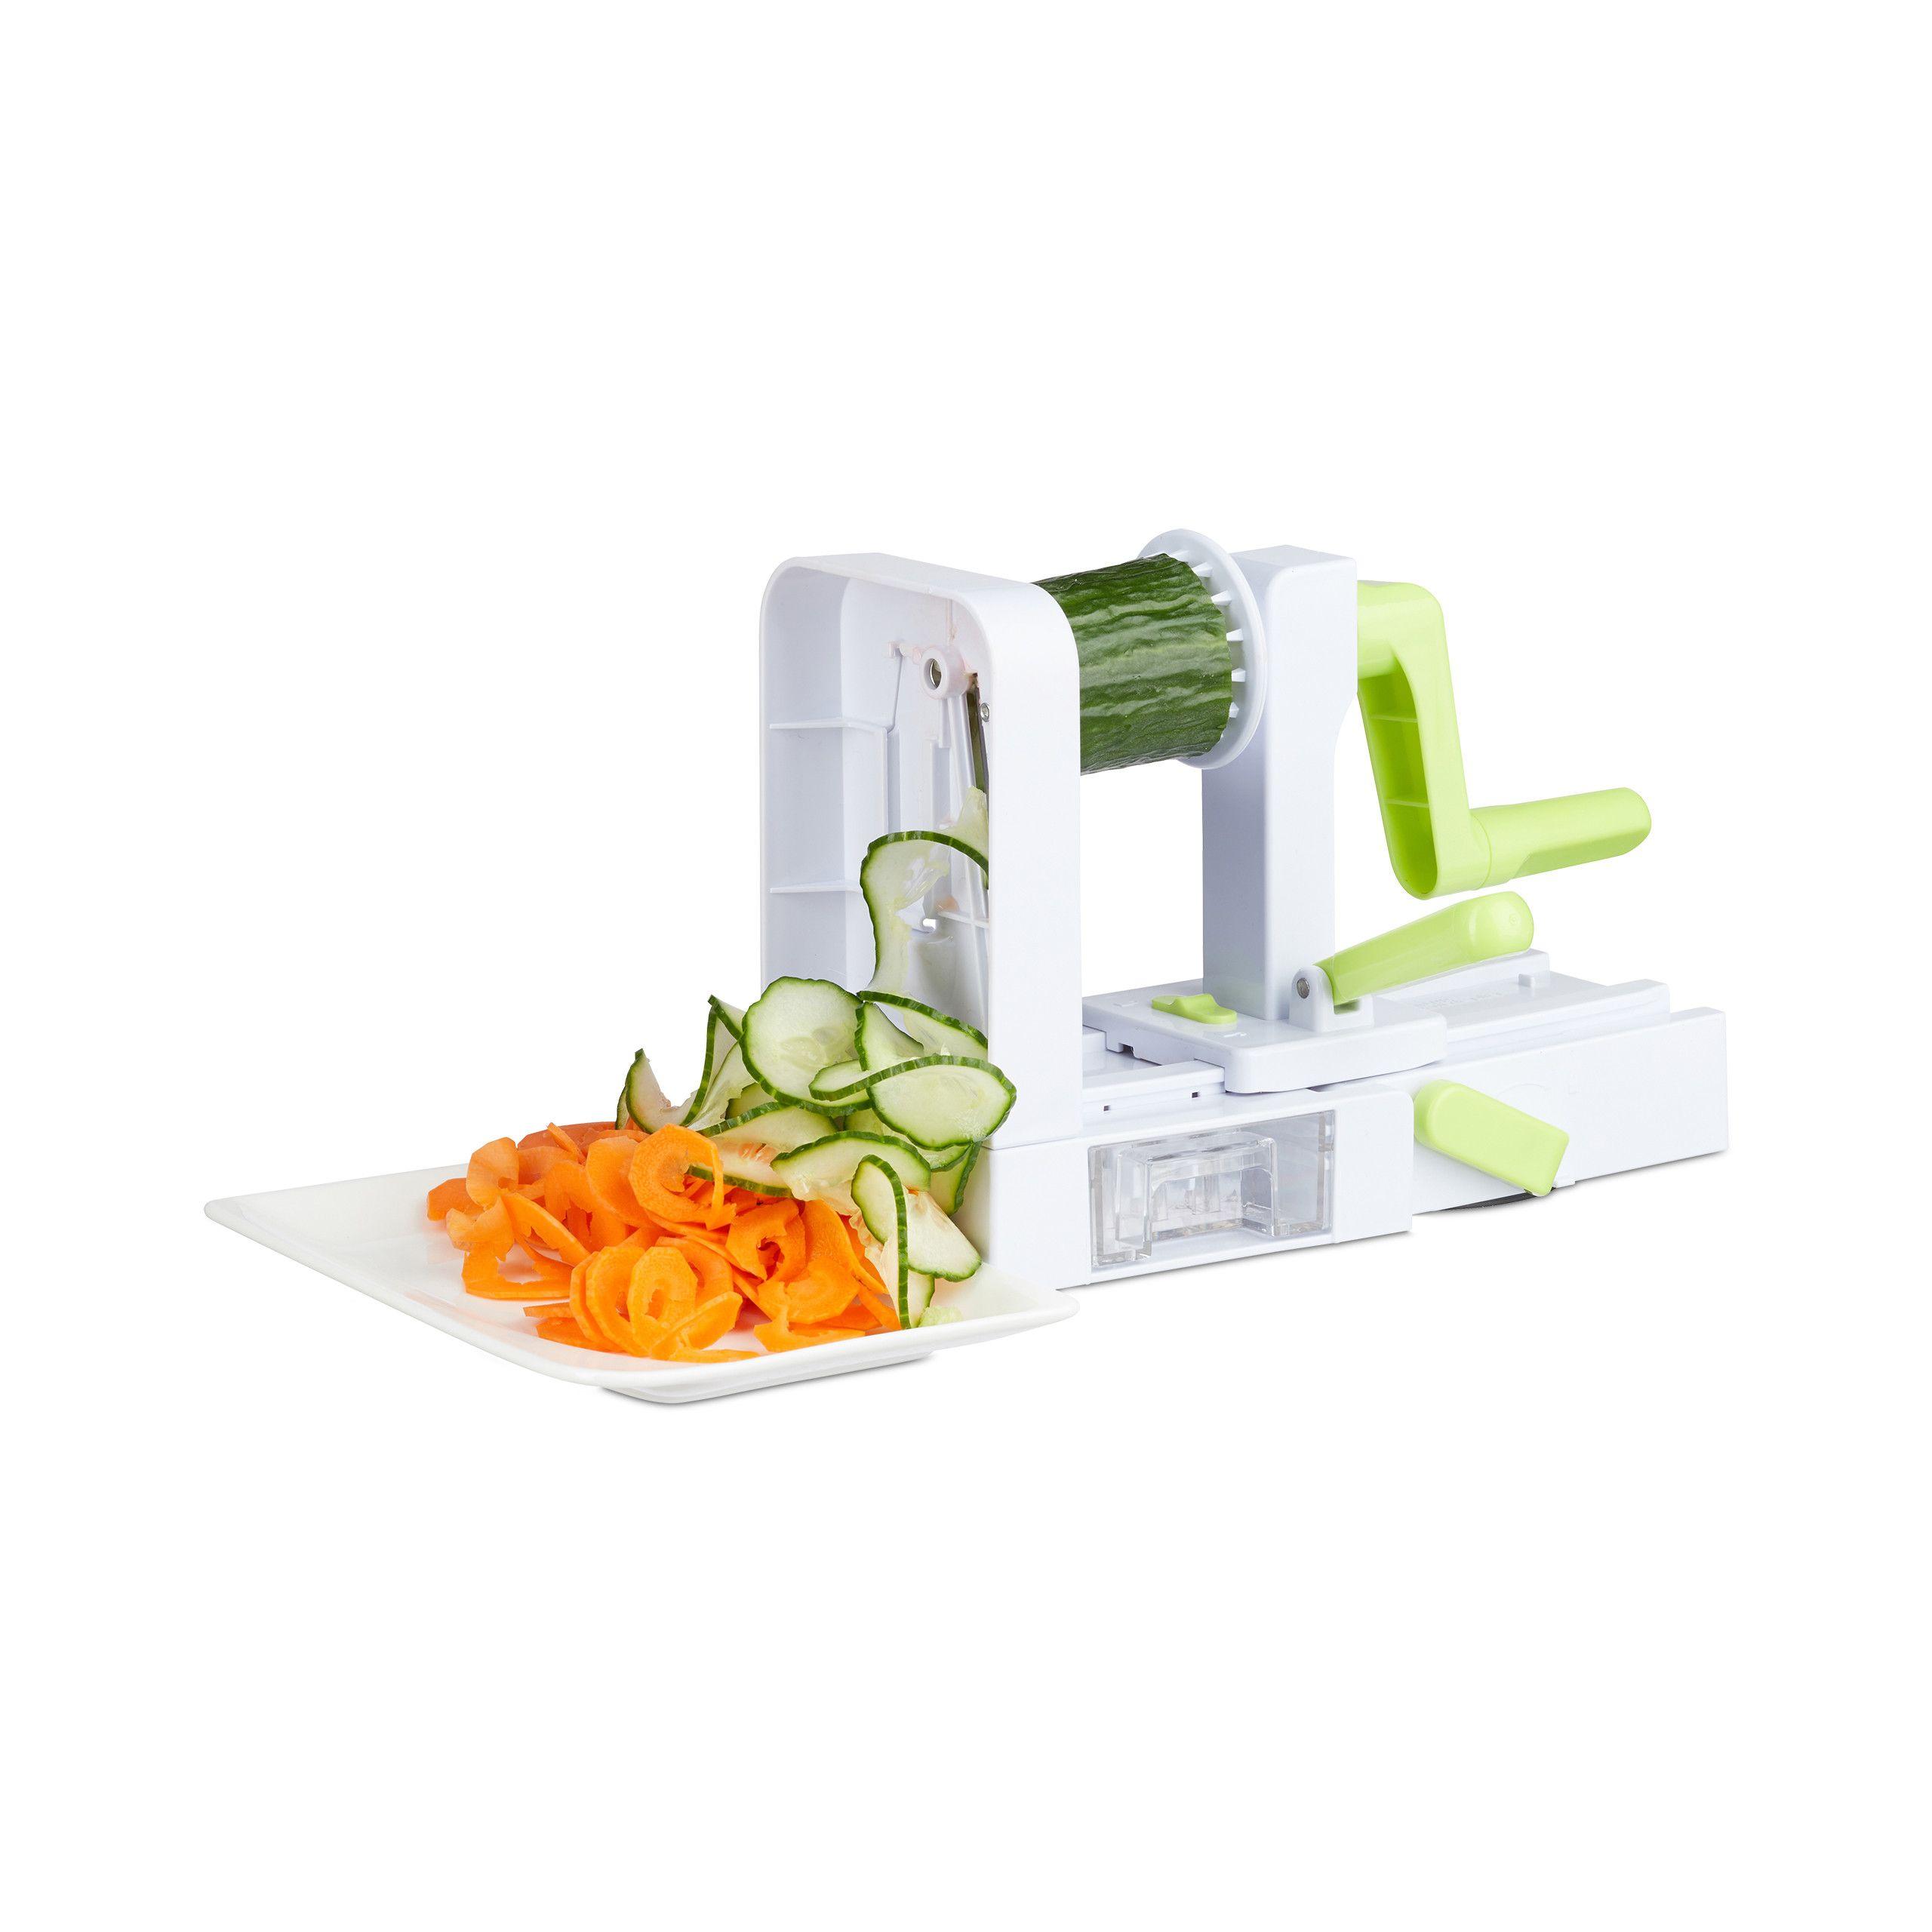 Skladacie strúhadlo/ špiralizér na zeleninu RD4690